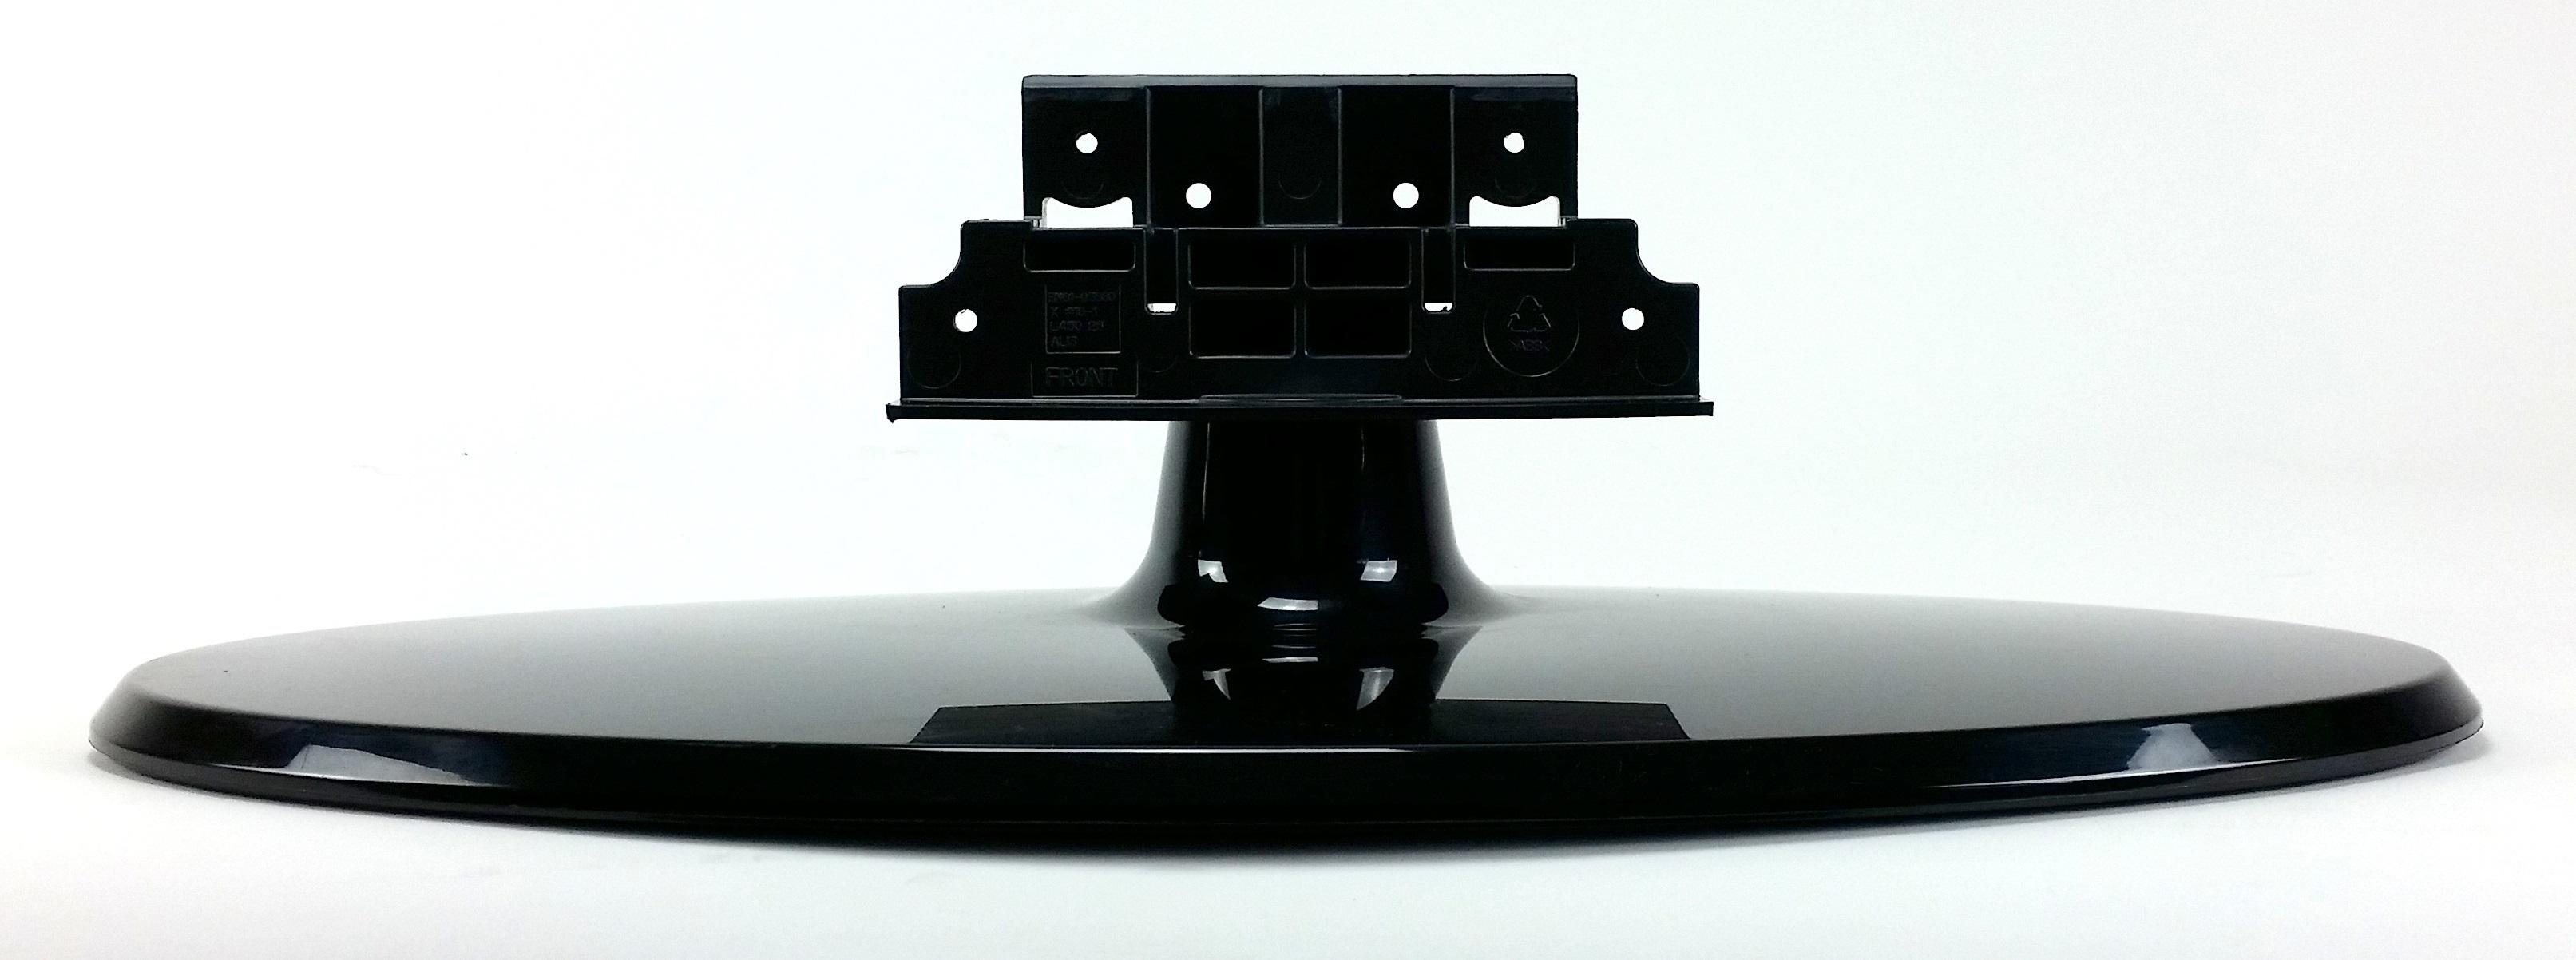 standfuss st nder f r samsung tv ger te 26 32 ebay. Black Bedroom Furniture Sets. Home Design Ideas